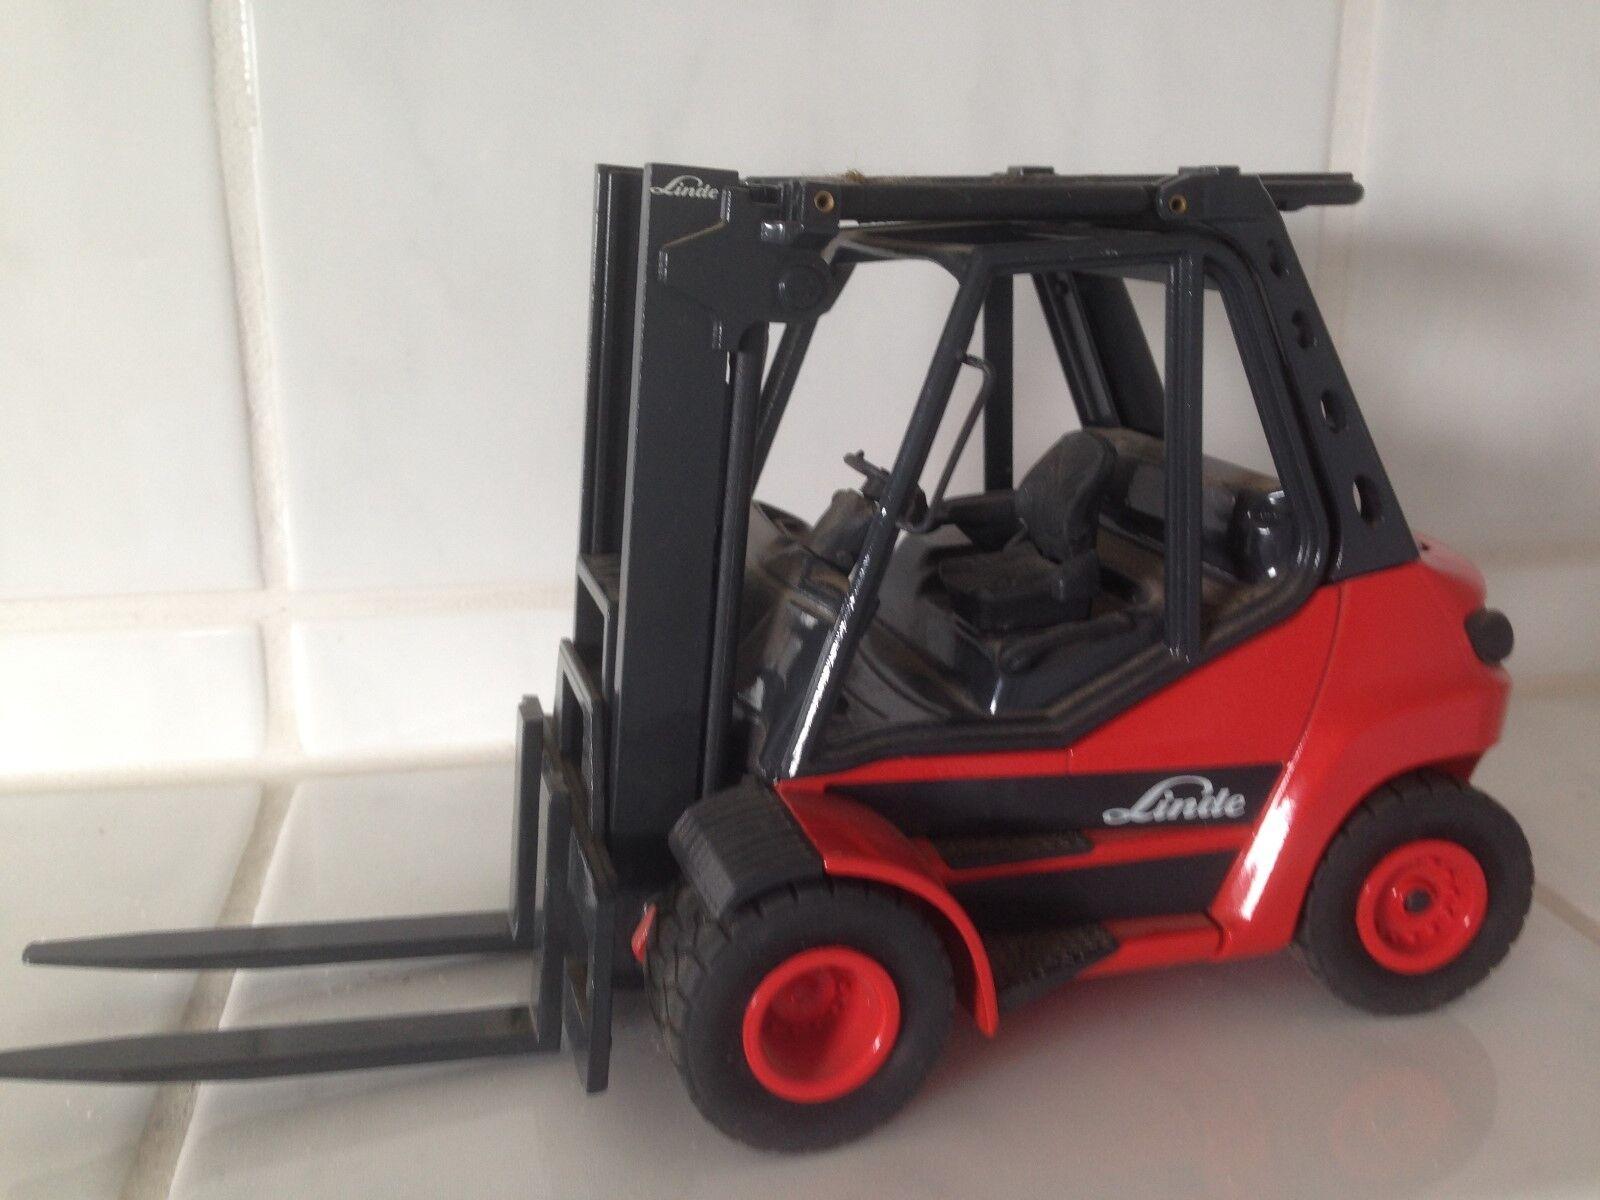 Linde Conrad camiones pesados H50-80 1100 Forklift MontaCochegas Muy Raro